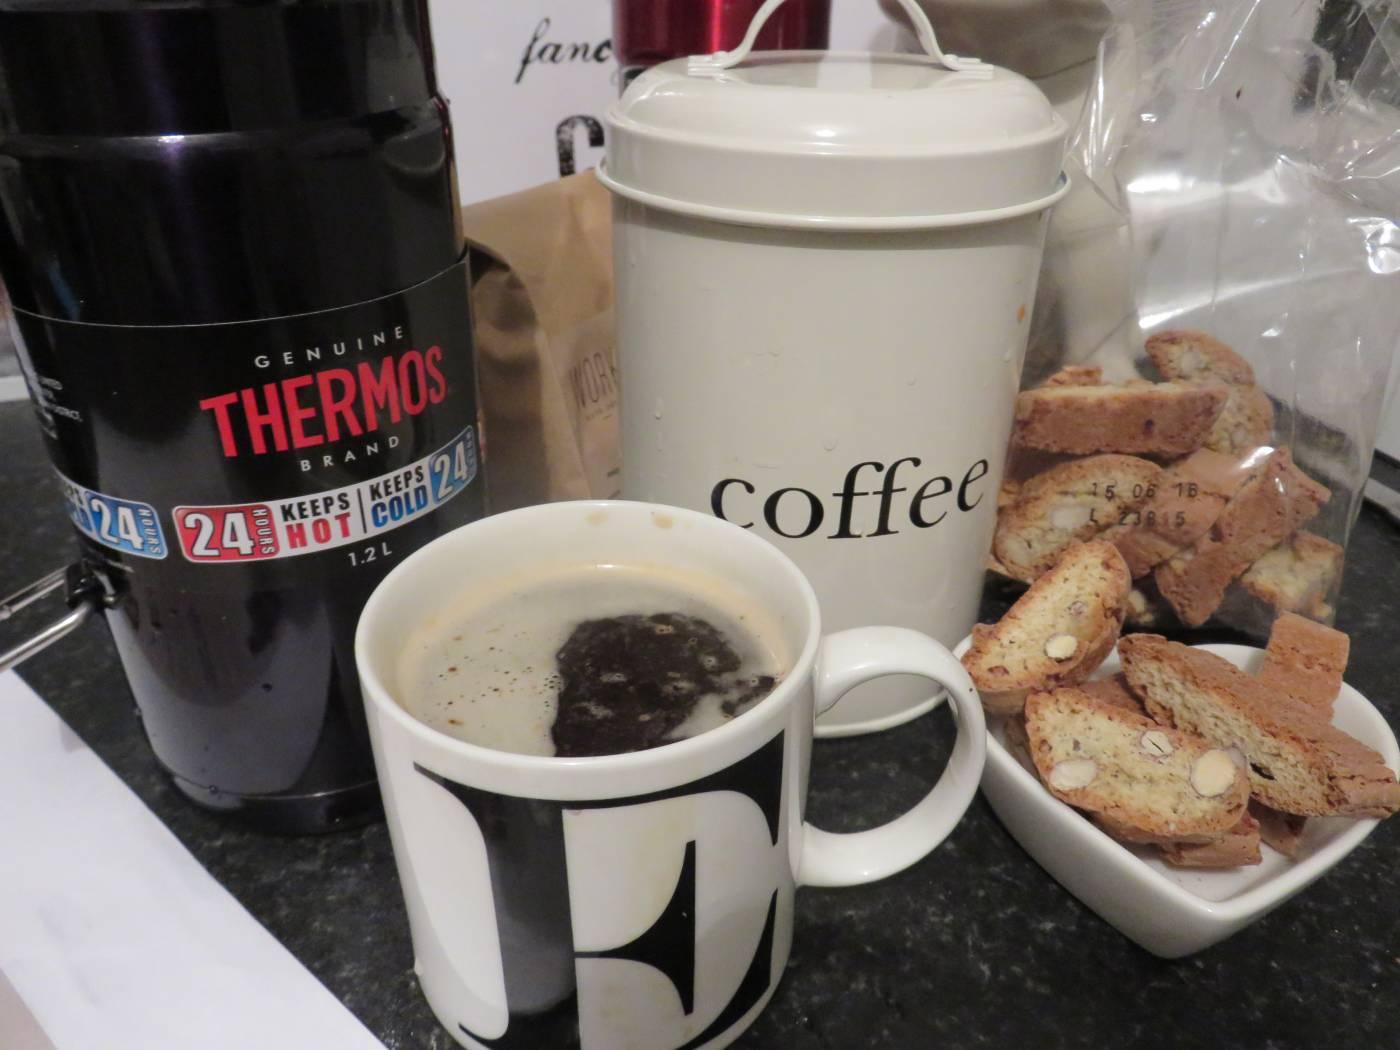 thermos overnight coffee